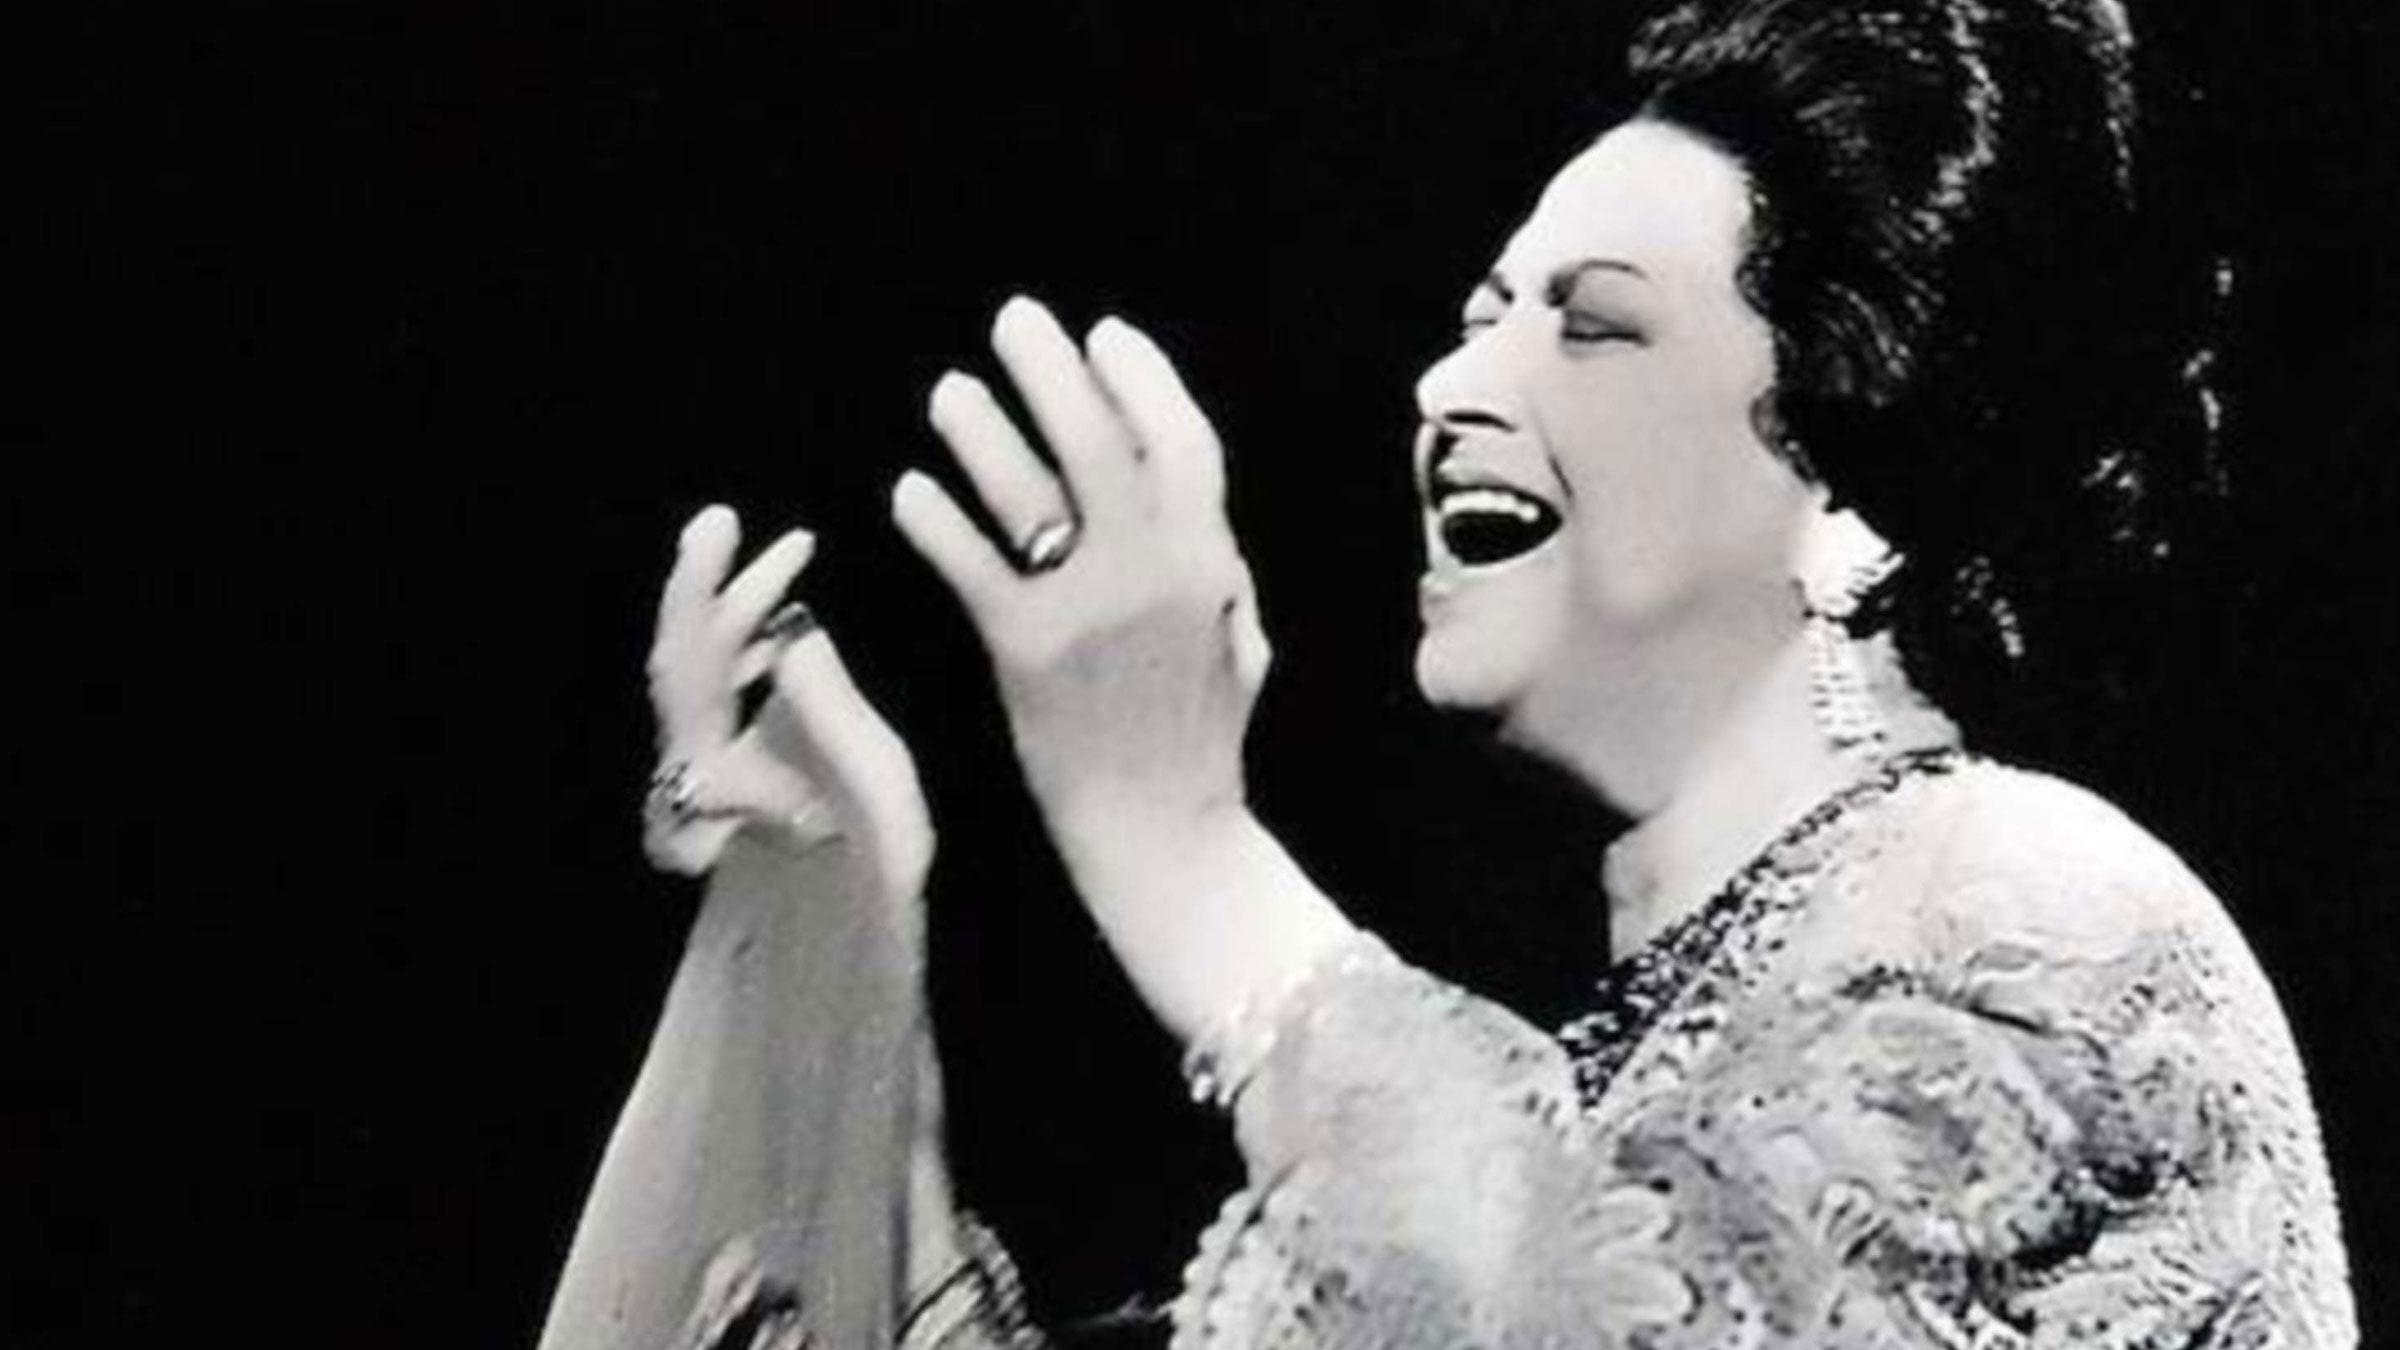 Umm Kulthum, A Voice Like Egypt